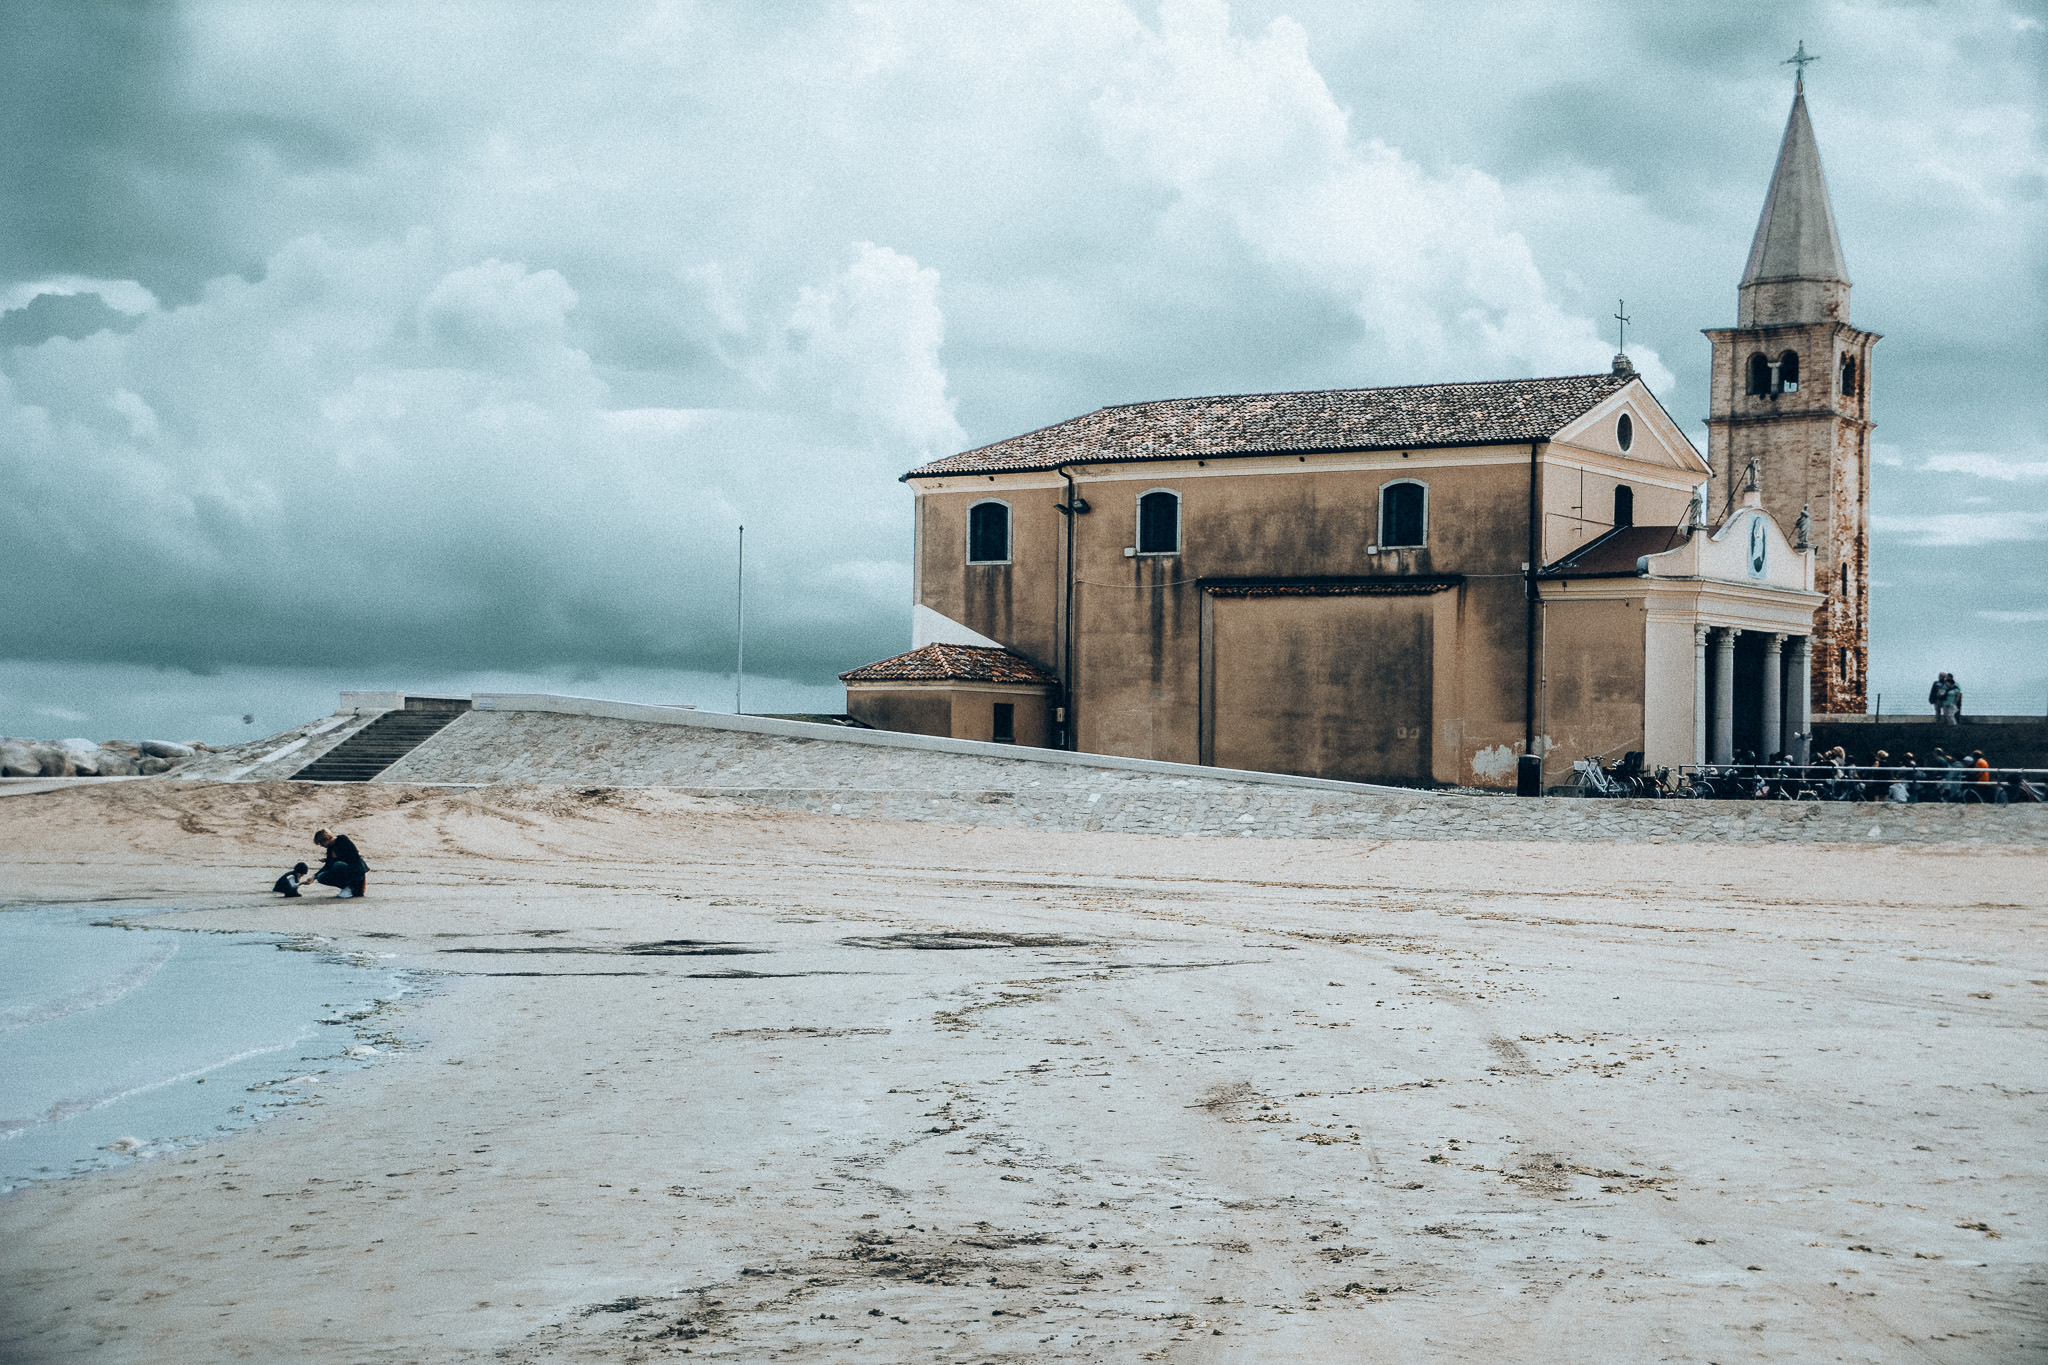 09-20-Caorle-beach-4_LR edited_FB.jpg